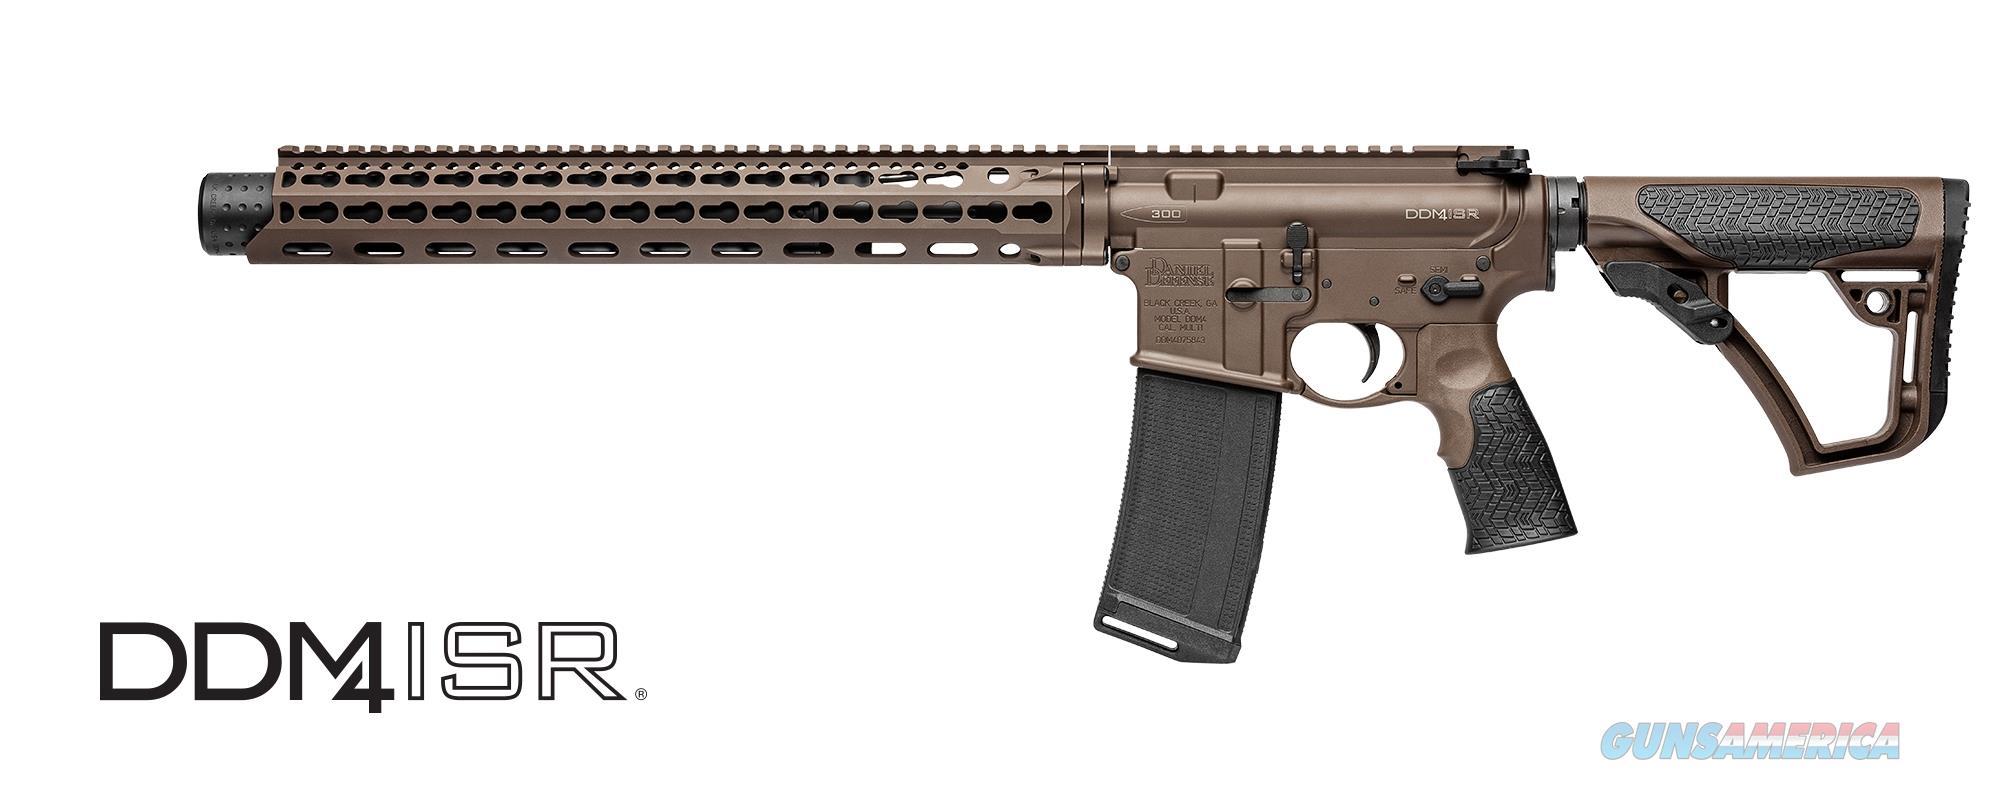 DANIELS DEFENSE DDM4 ISR CLASS 3 300 BLACKOUT!!!  Guns > Rifles > Daniel Defense > Complete Rifles